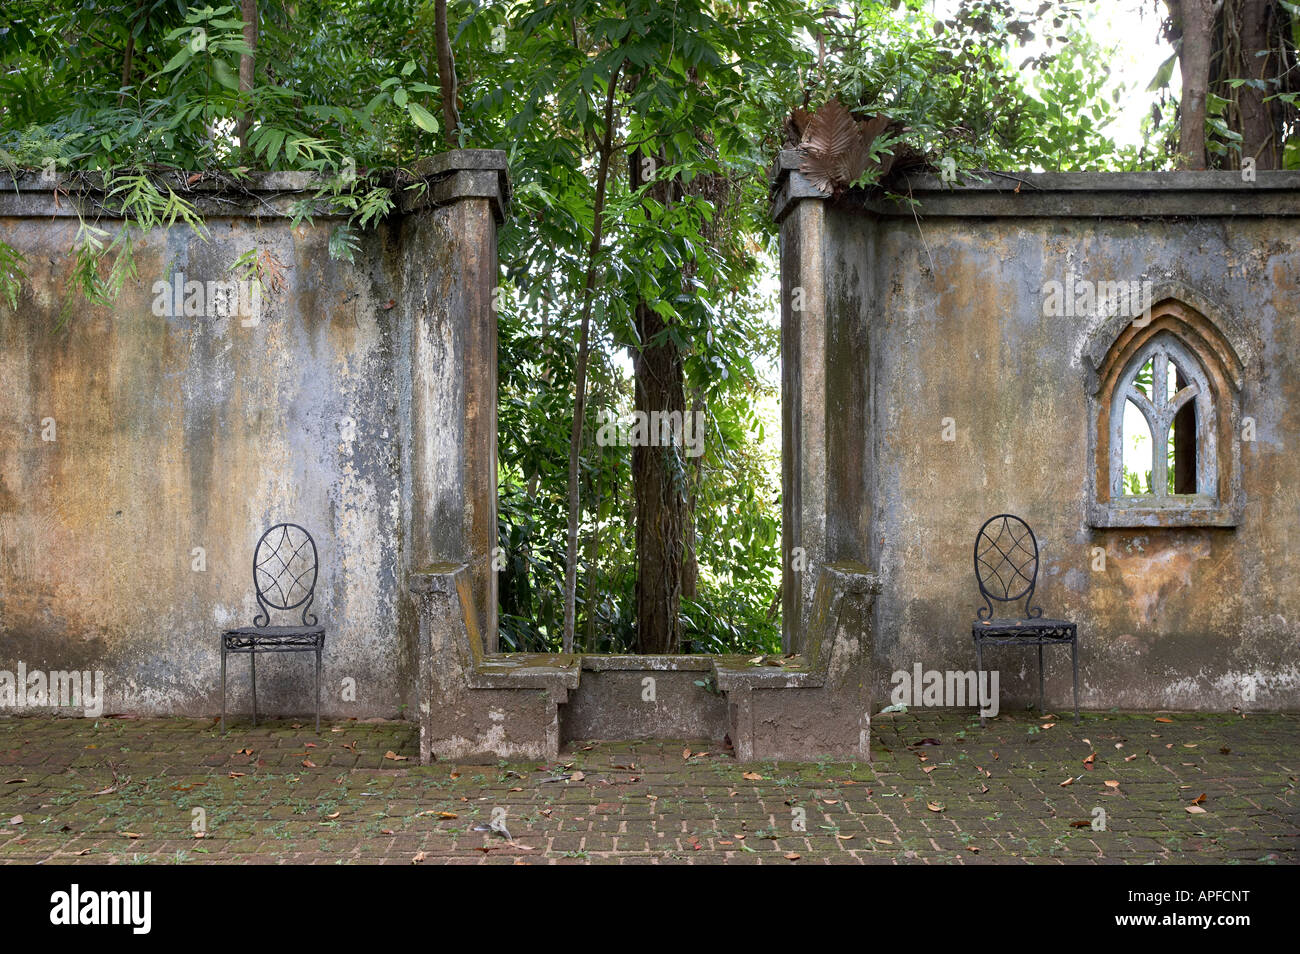 Lunuganga, Sri Lanka.Country home of the late Geoffrey Bawa now a boutique hotel Architect: Geoffrey Bawa - Stock Image